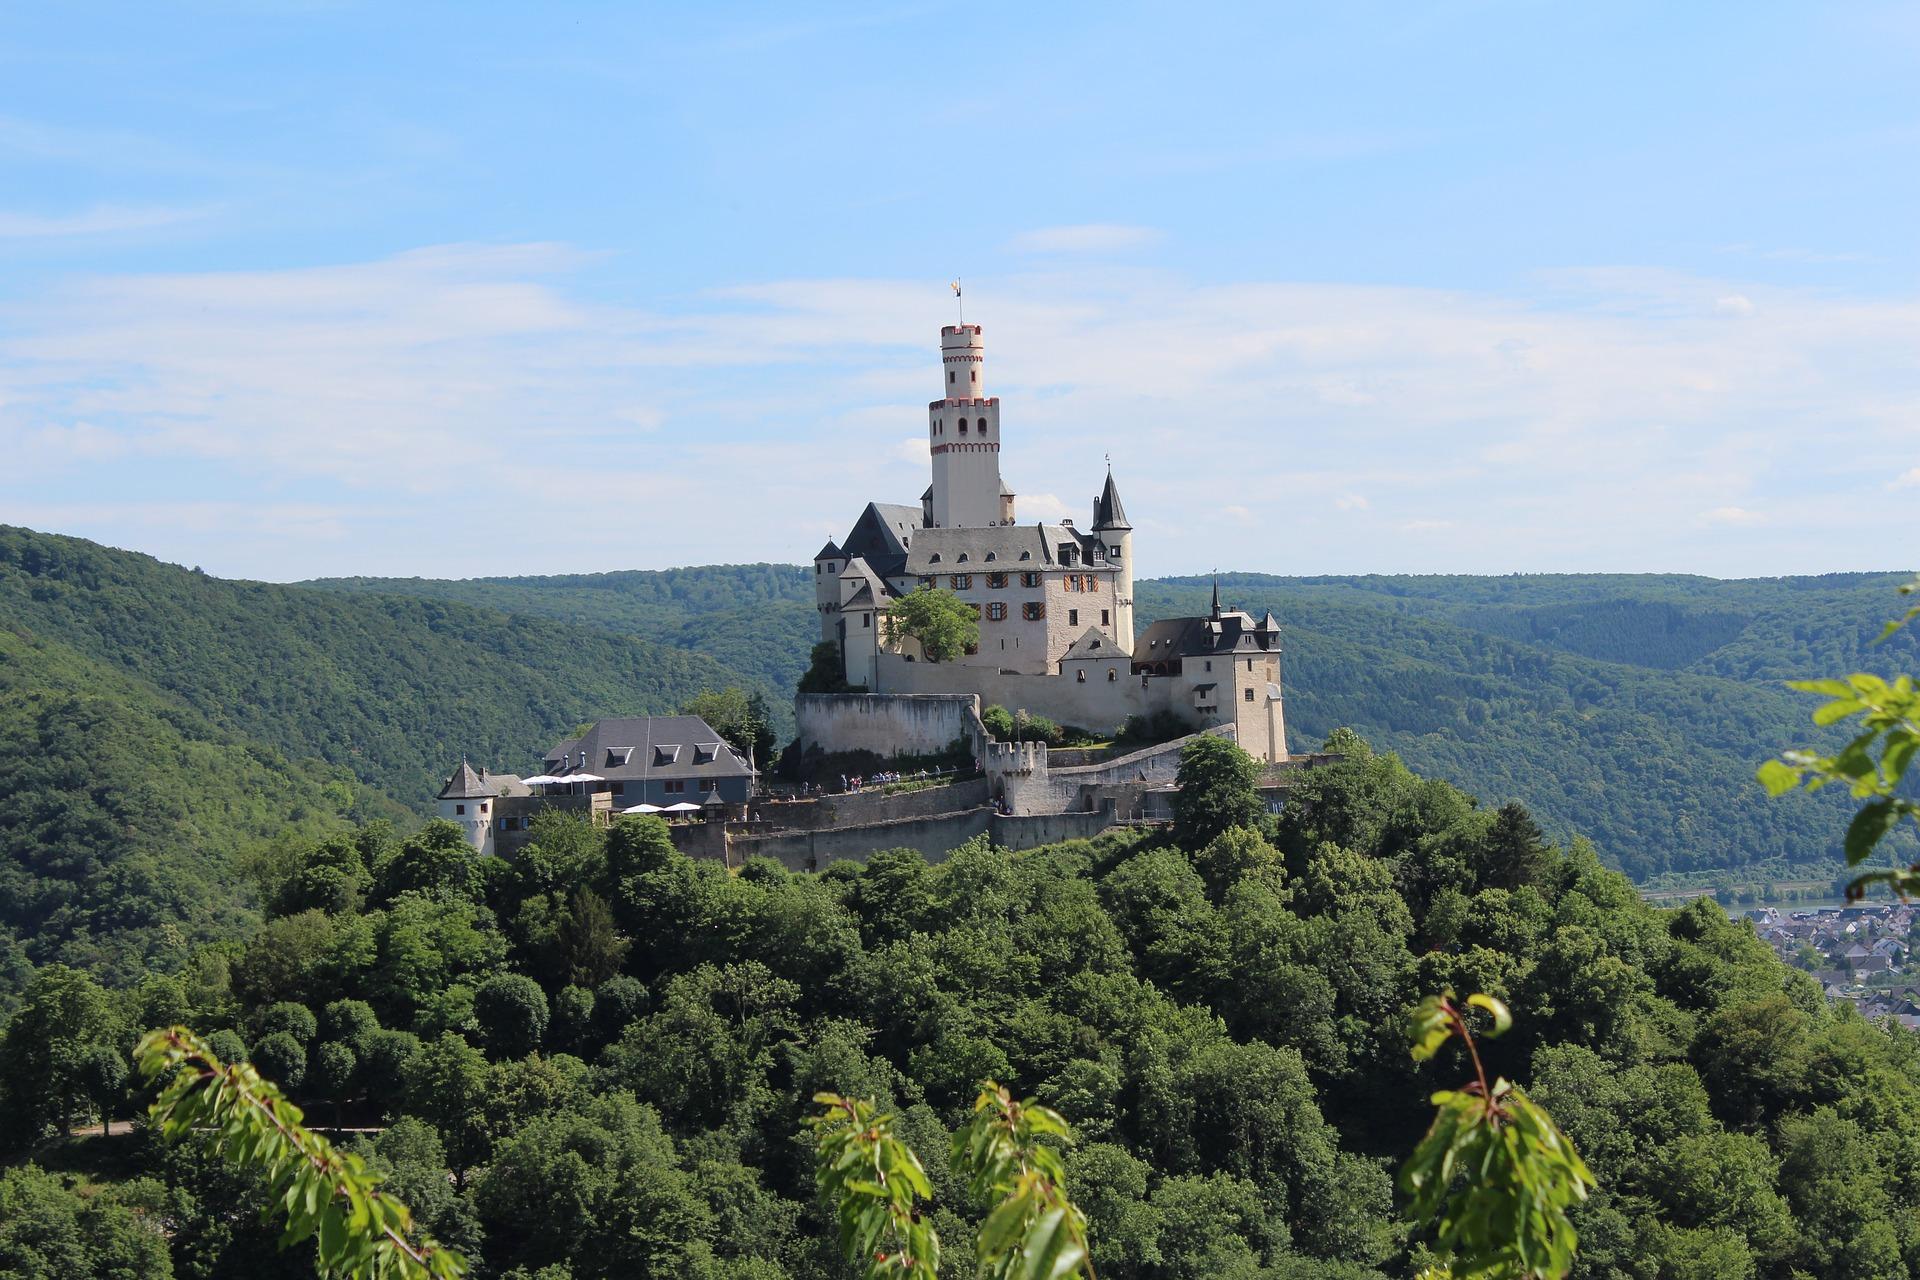 mark-castle-2156383_1920